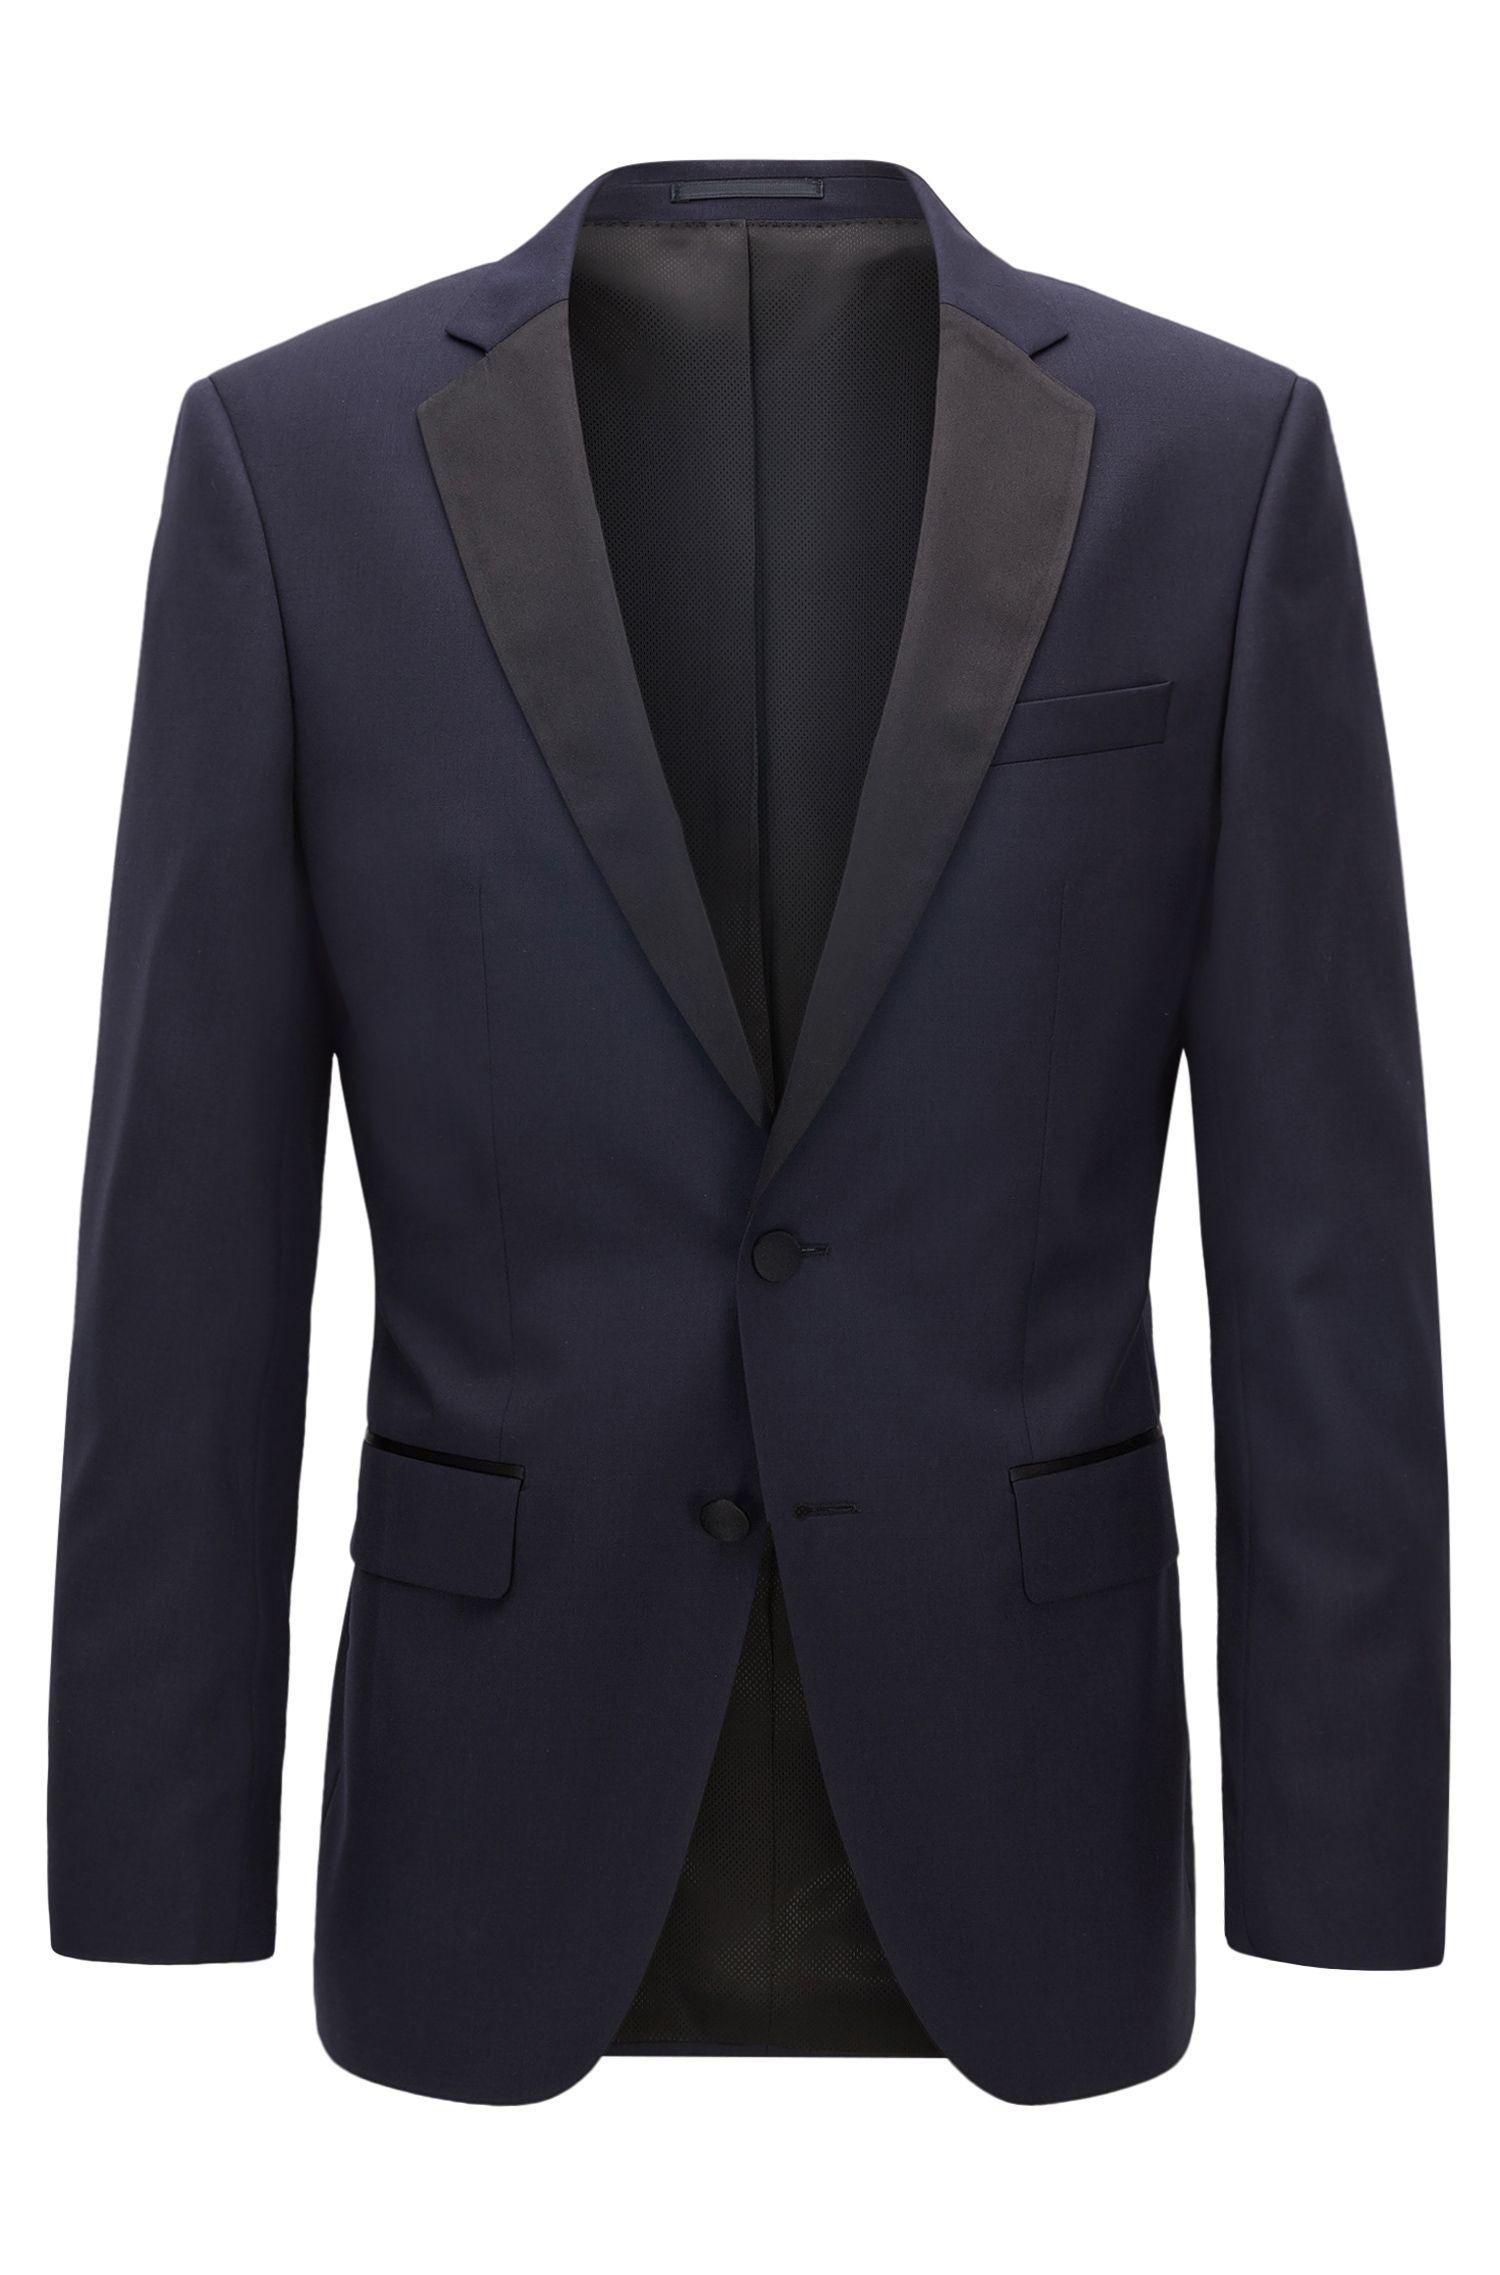 Italian Virgin Wool Suit Jacket, Slim Fit | Hence CYL